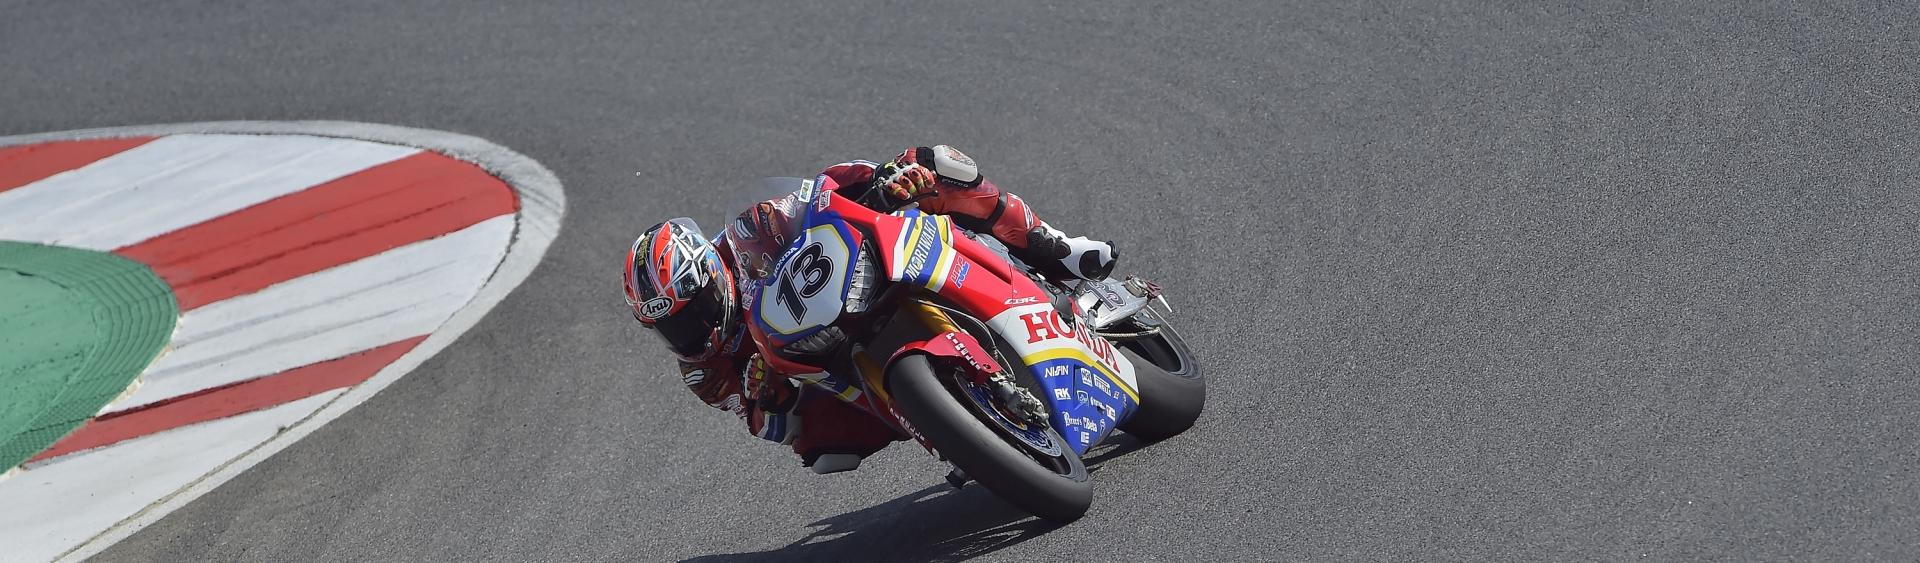 WSBK | Honda Pro Racing